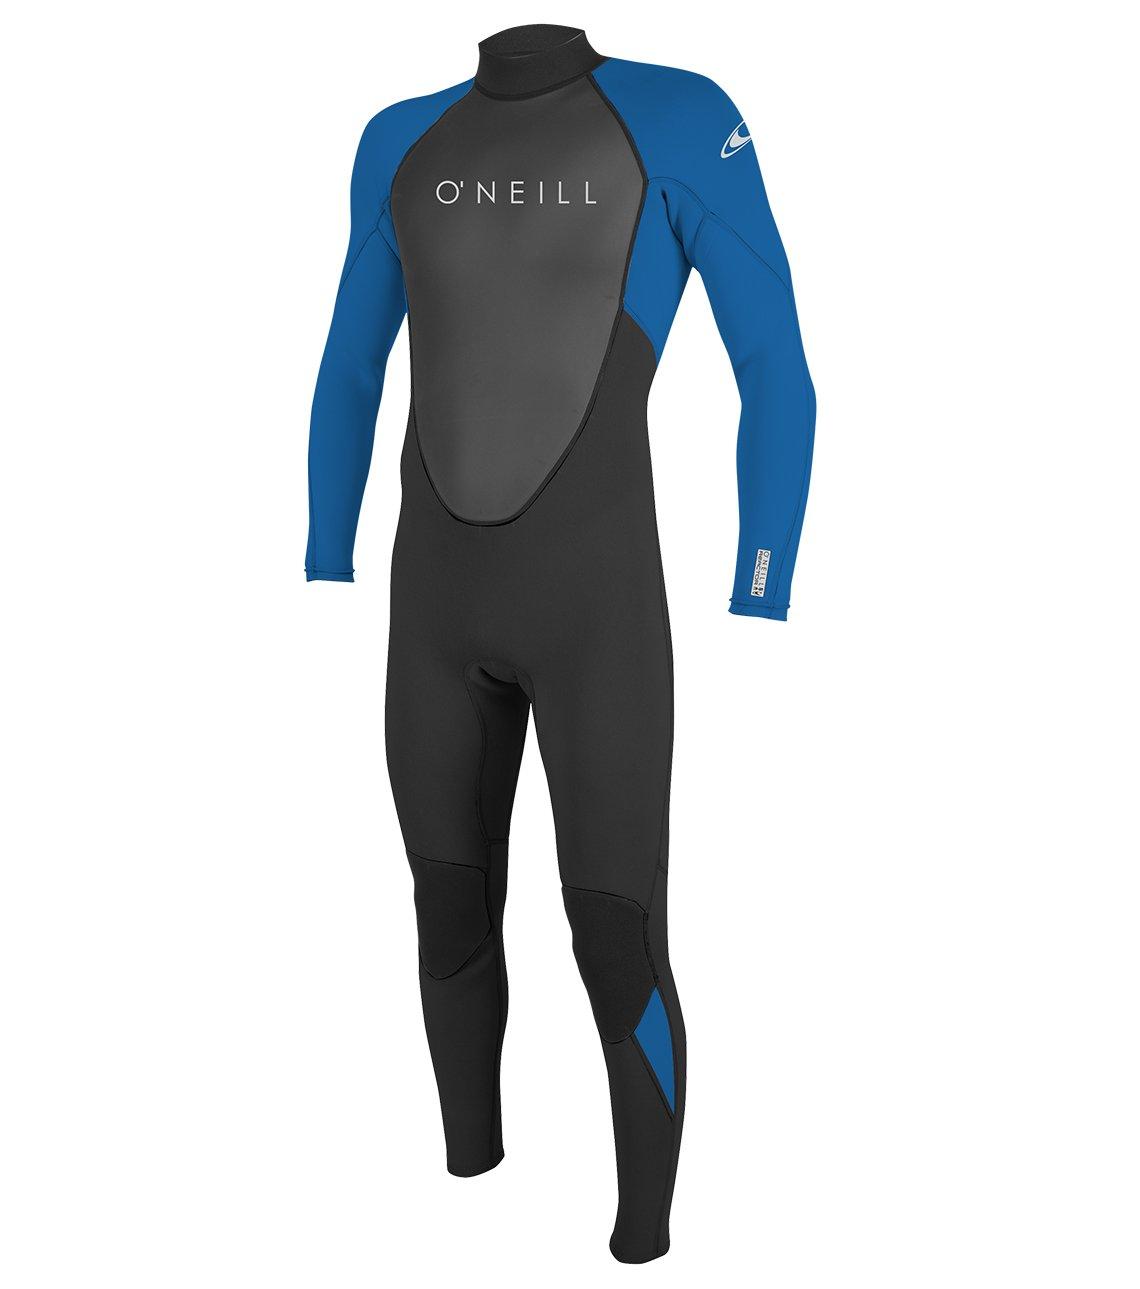 Bleu océan 14 ans O'Neill Reactor II Back Zip Full Combinaison de plongée Enfant